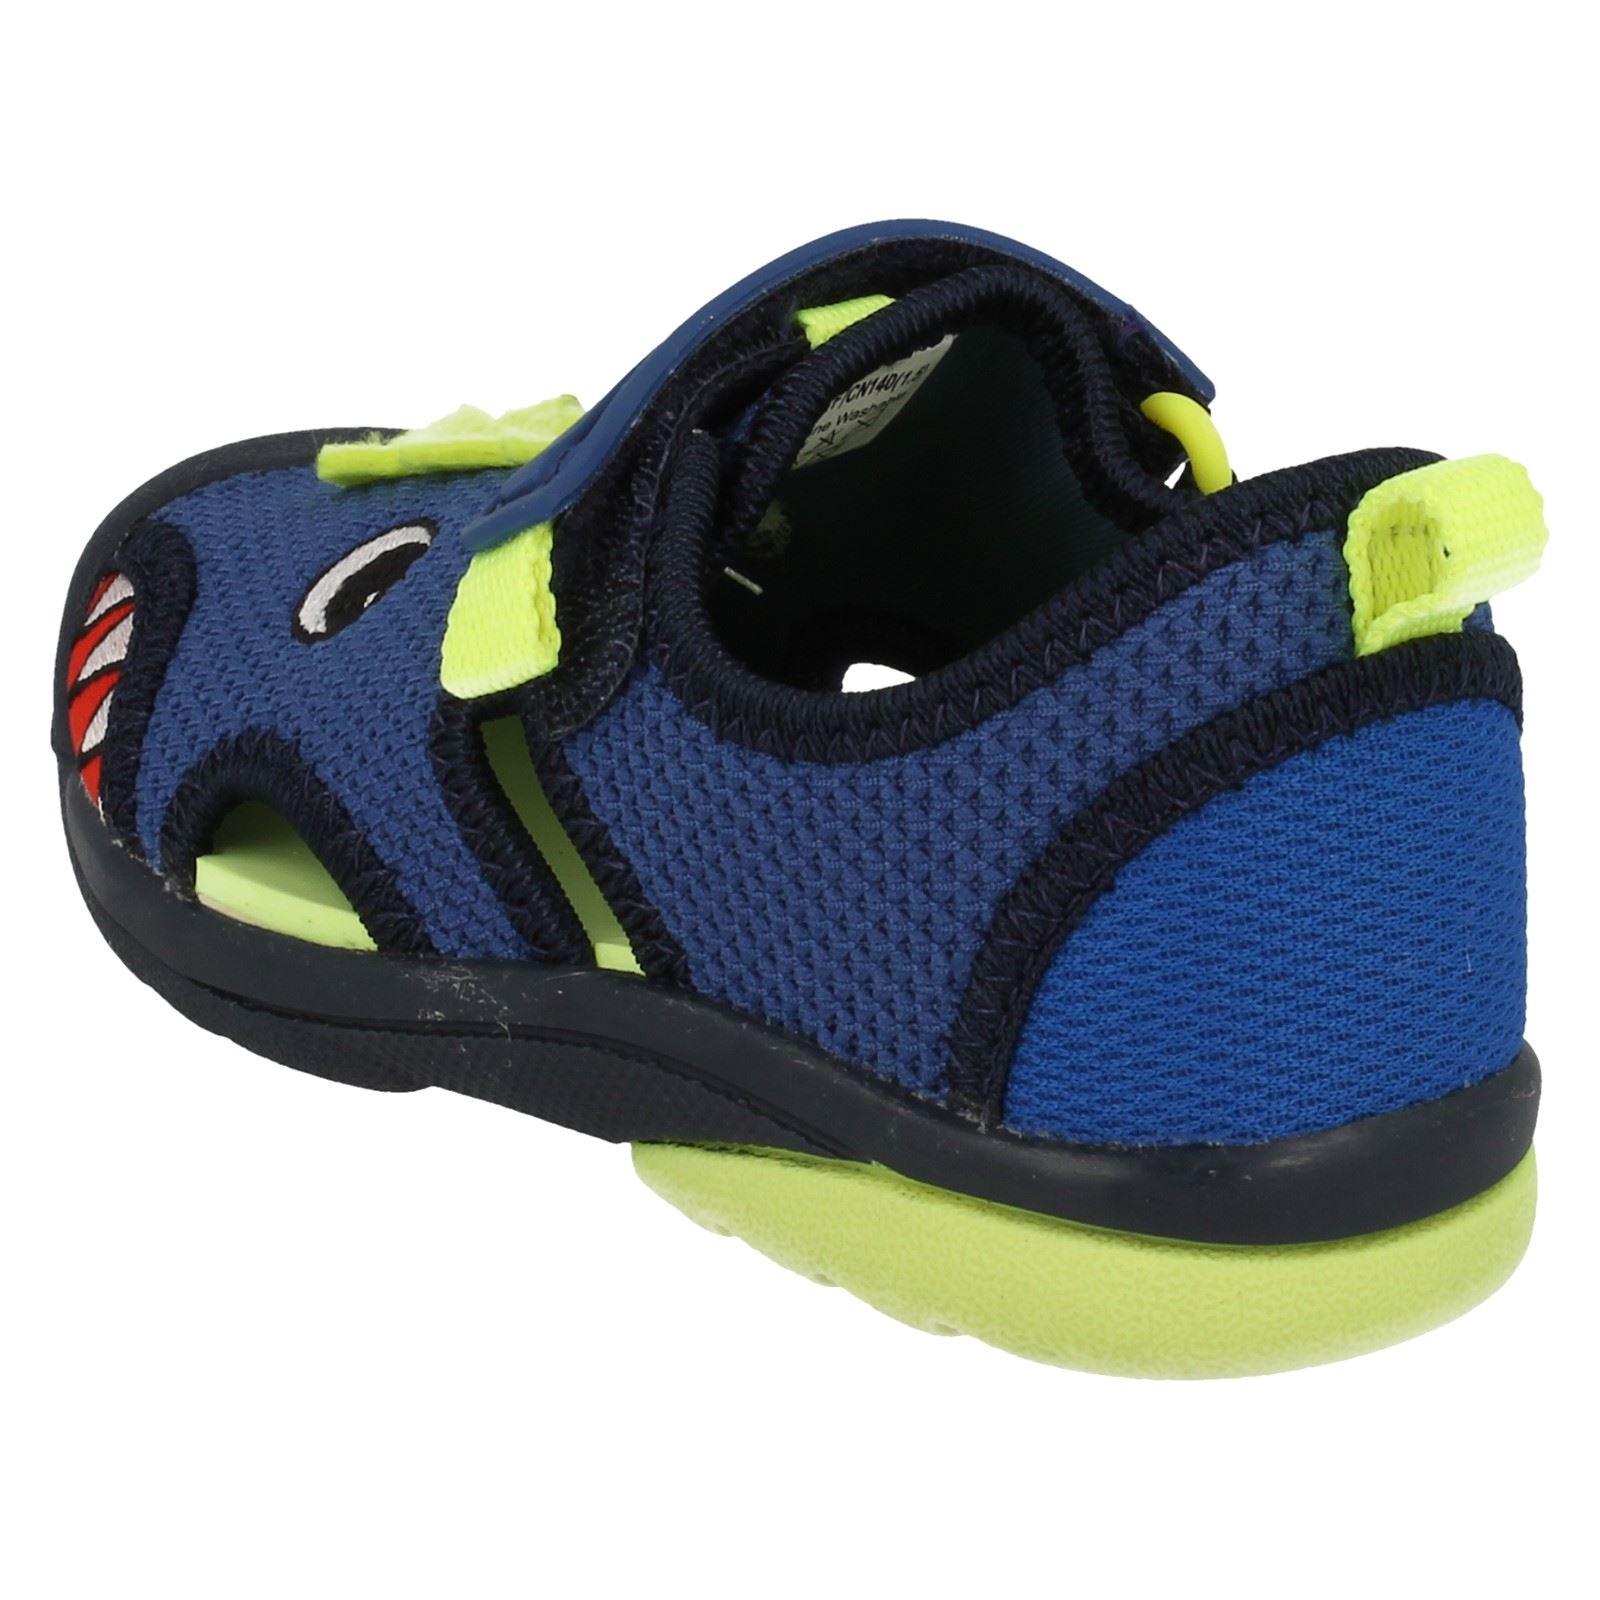 Boys Clarks Casual Shoes Beach Curl